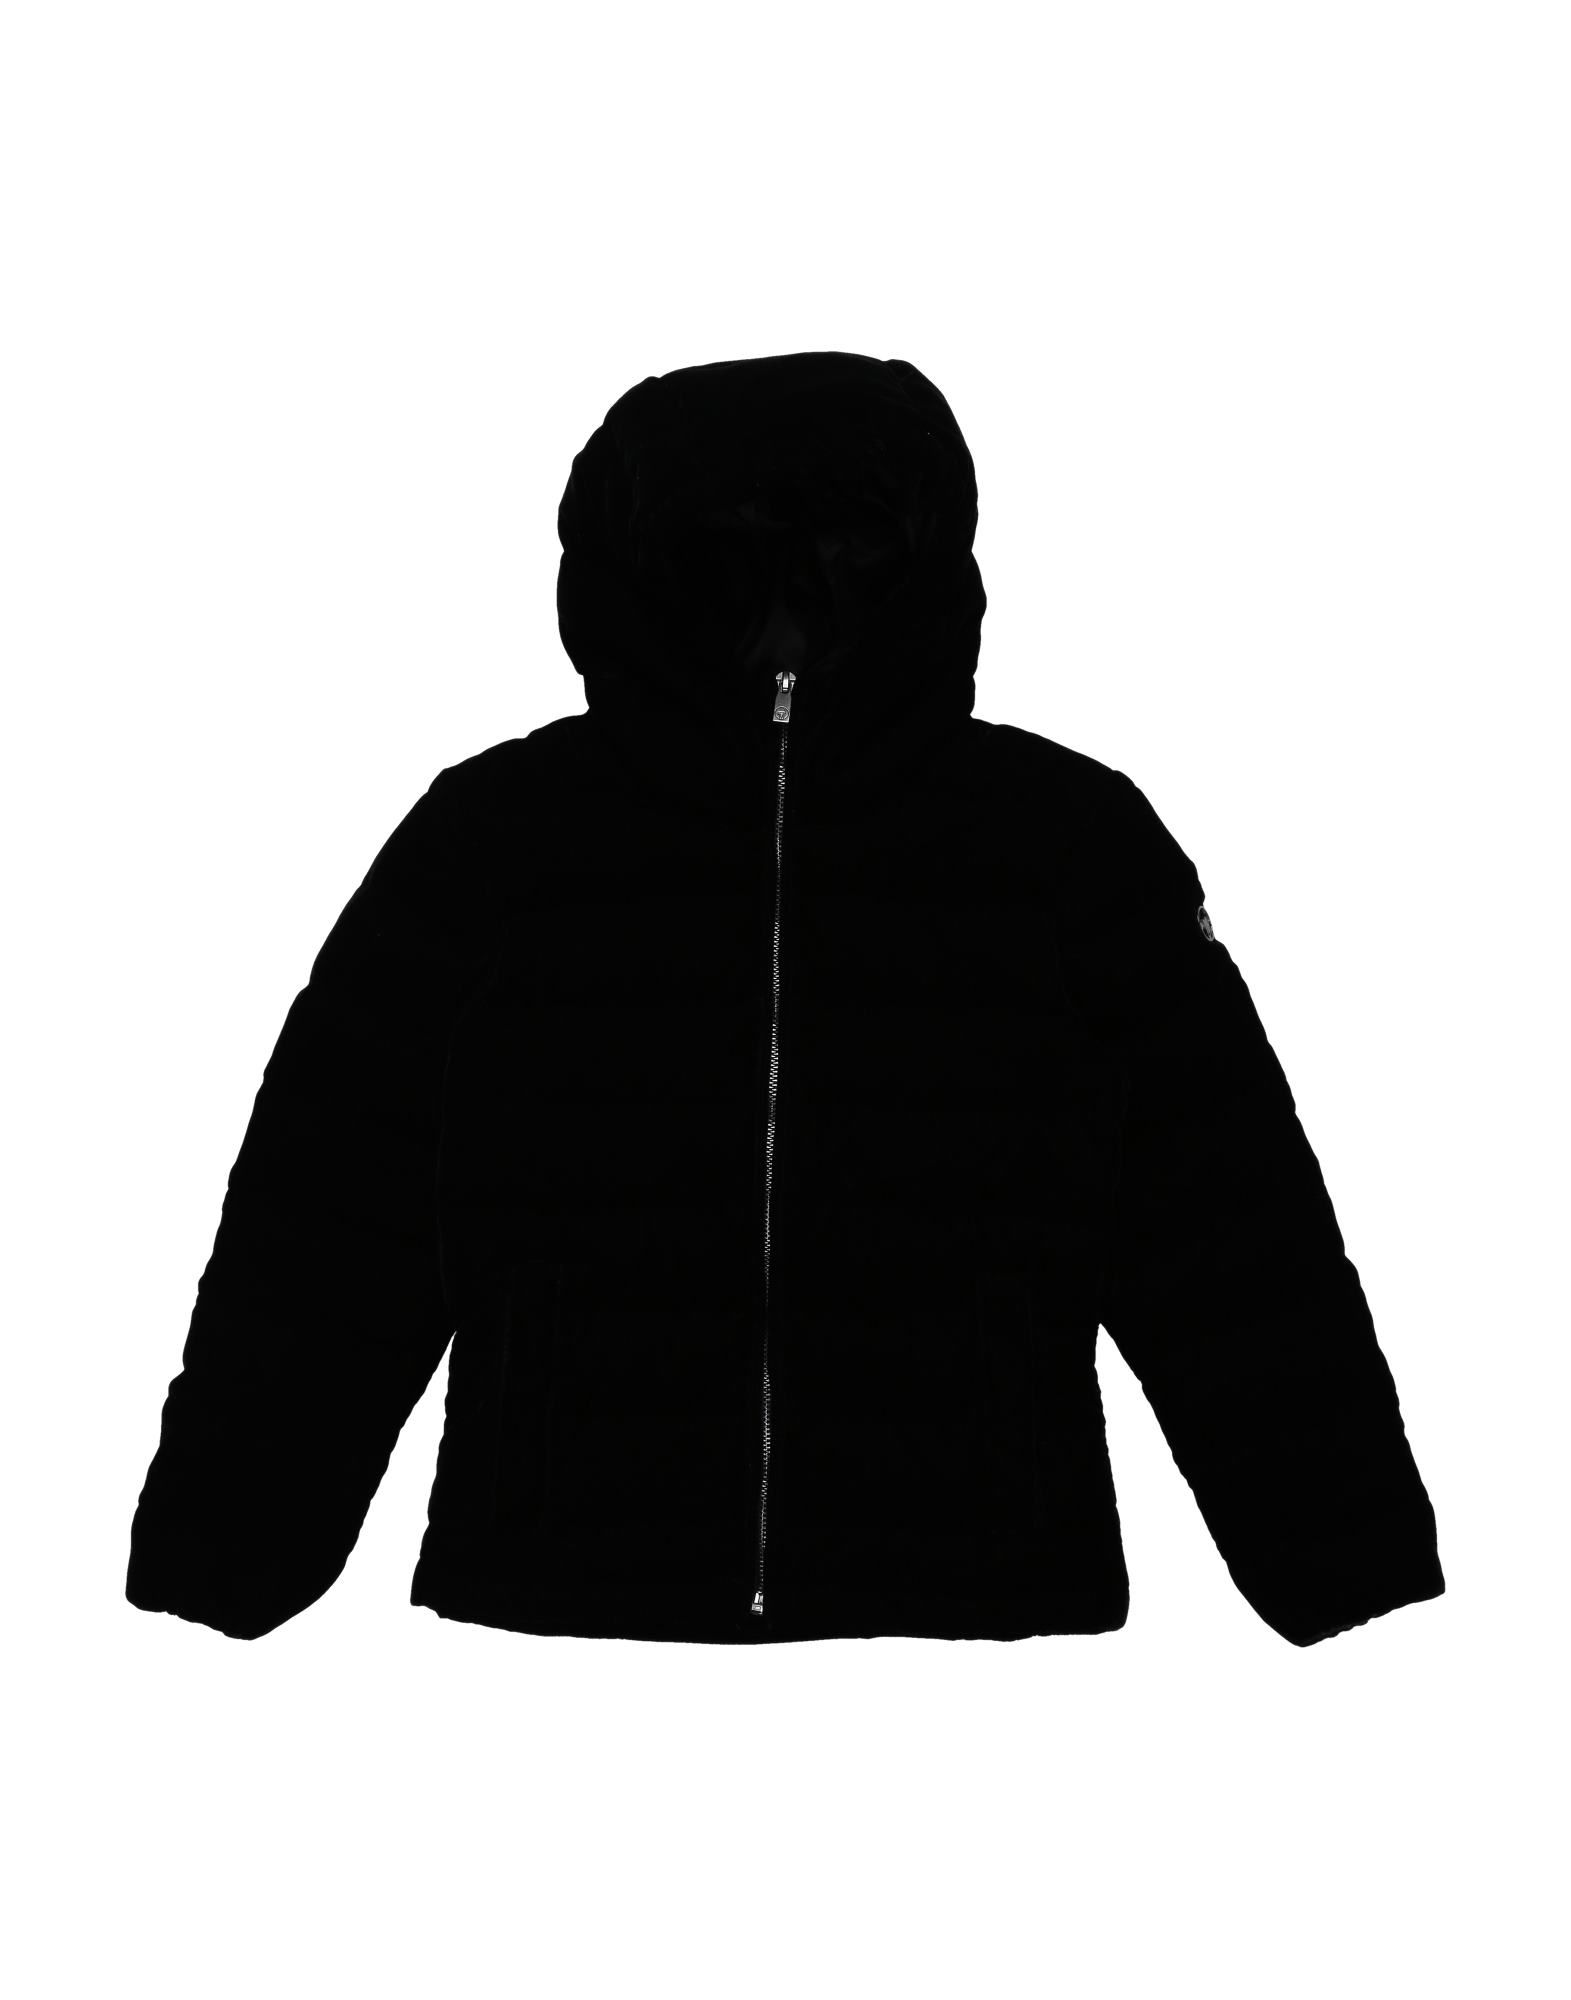 official photos 89db7 d08f2 CIESSE PIUMINI Down jacket - Coats & Jackets   YOOX.COM